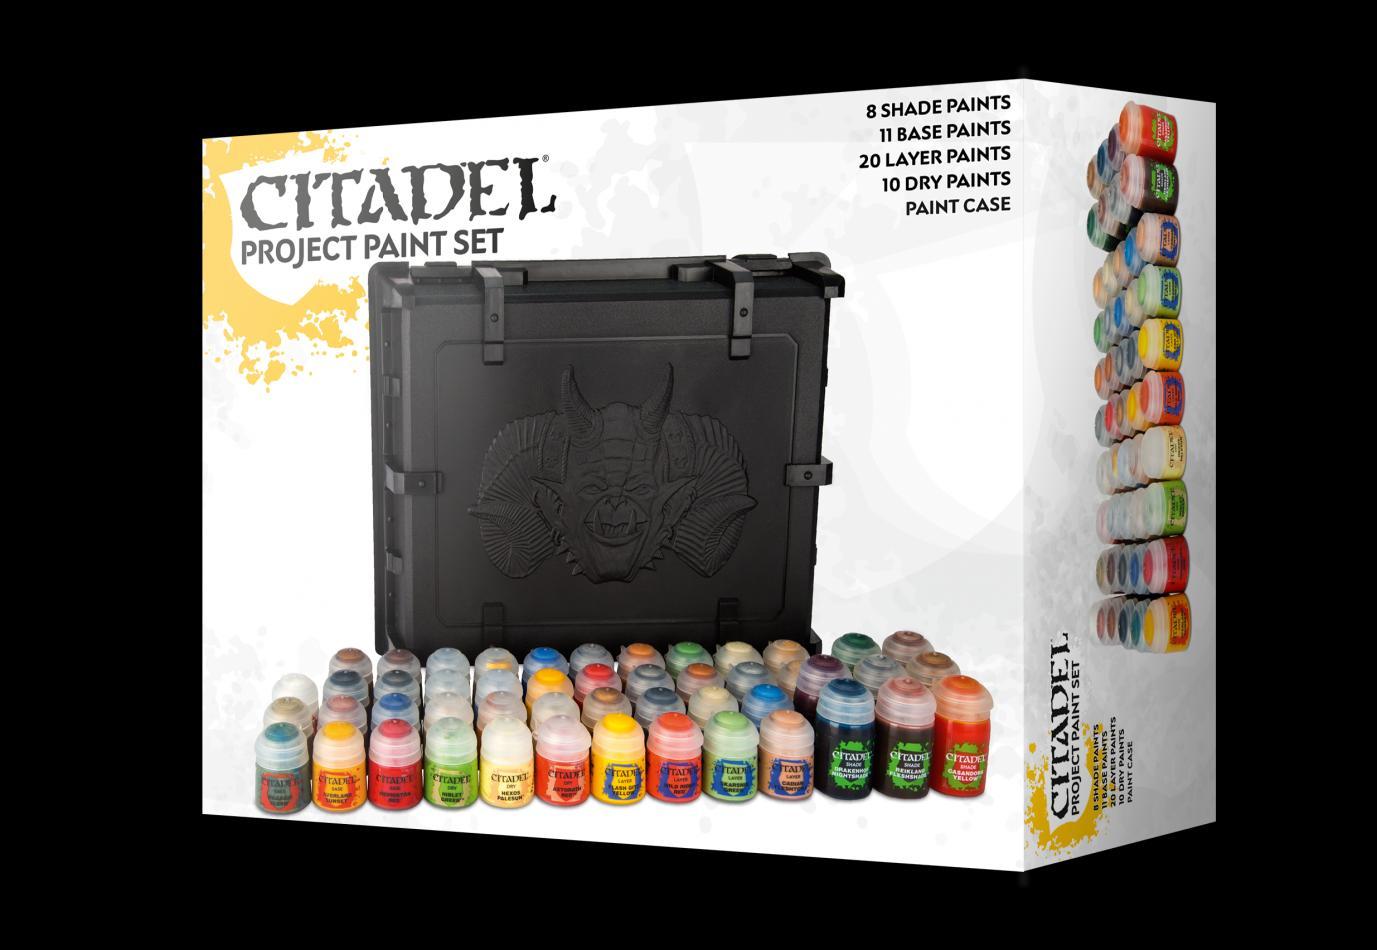 citadel project paint set 2017